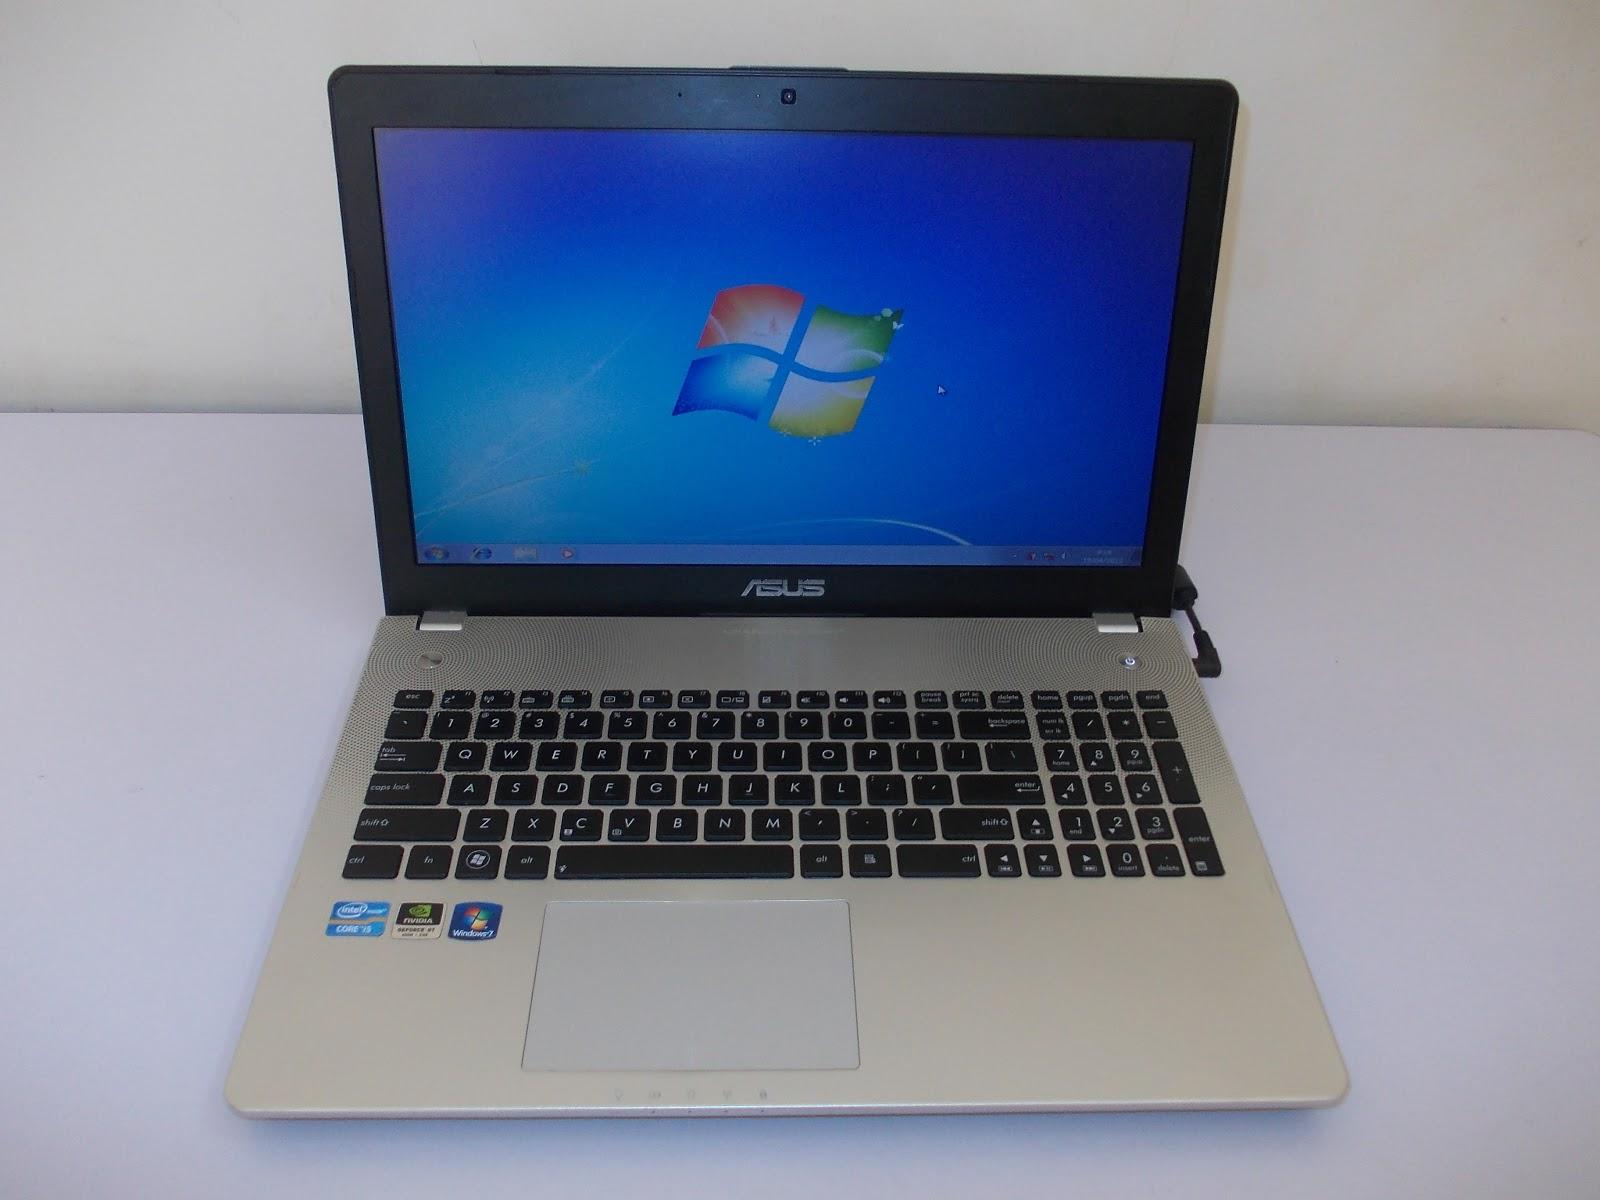 ASUS N56V: laptop specifications 34